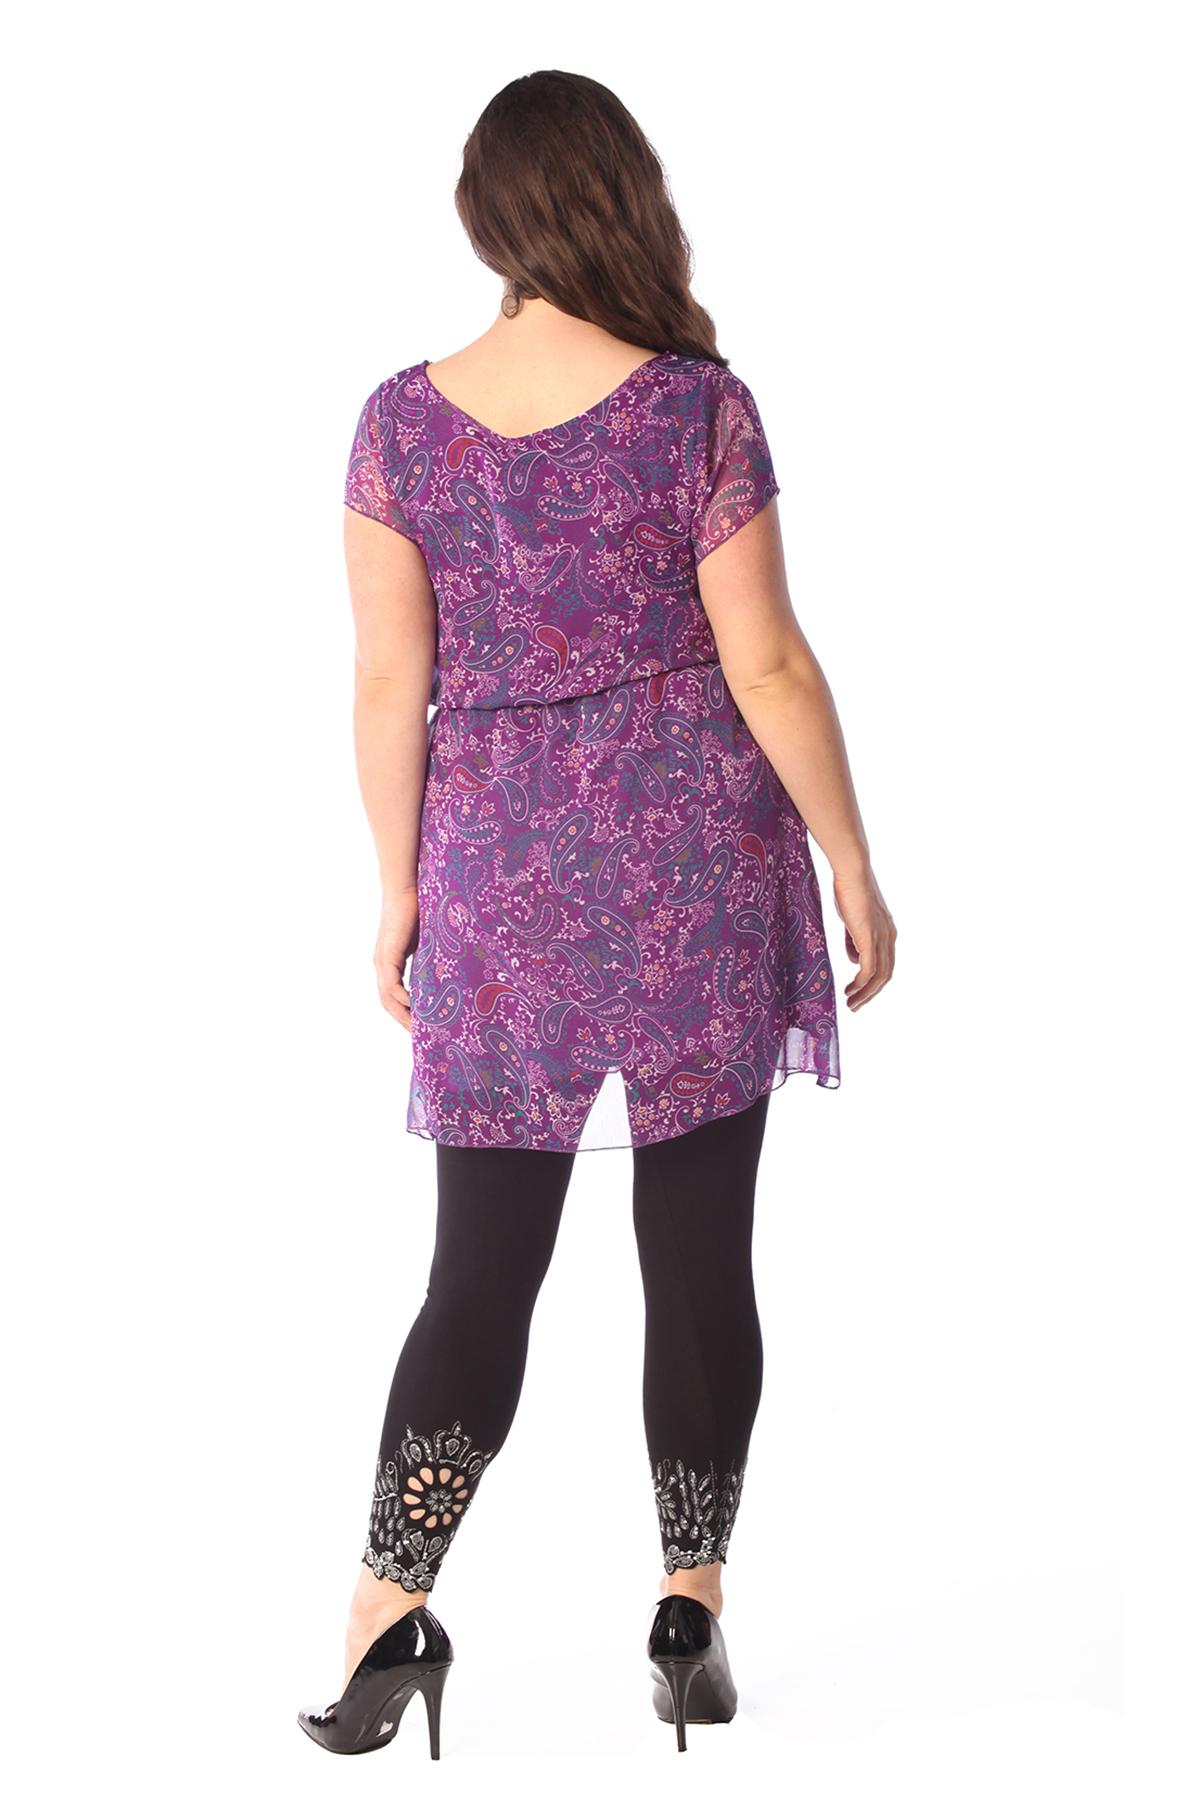 Womens Top Ladies Plus Size Paisley Print Chiffon Mini Dress Elastic Nouvelle